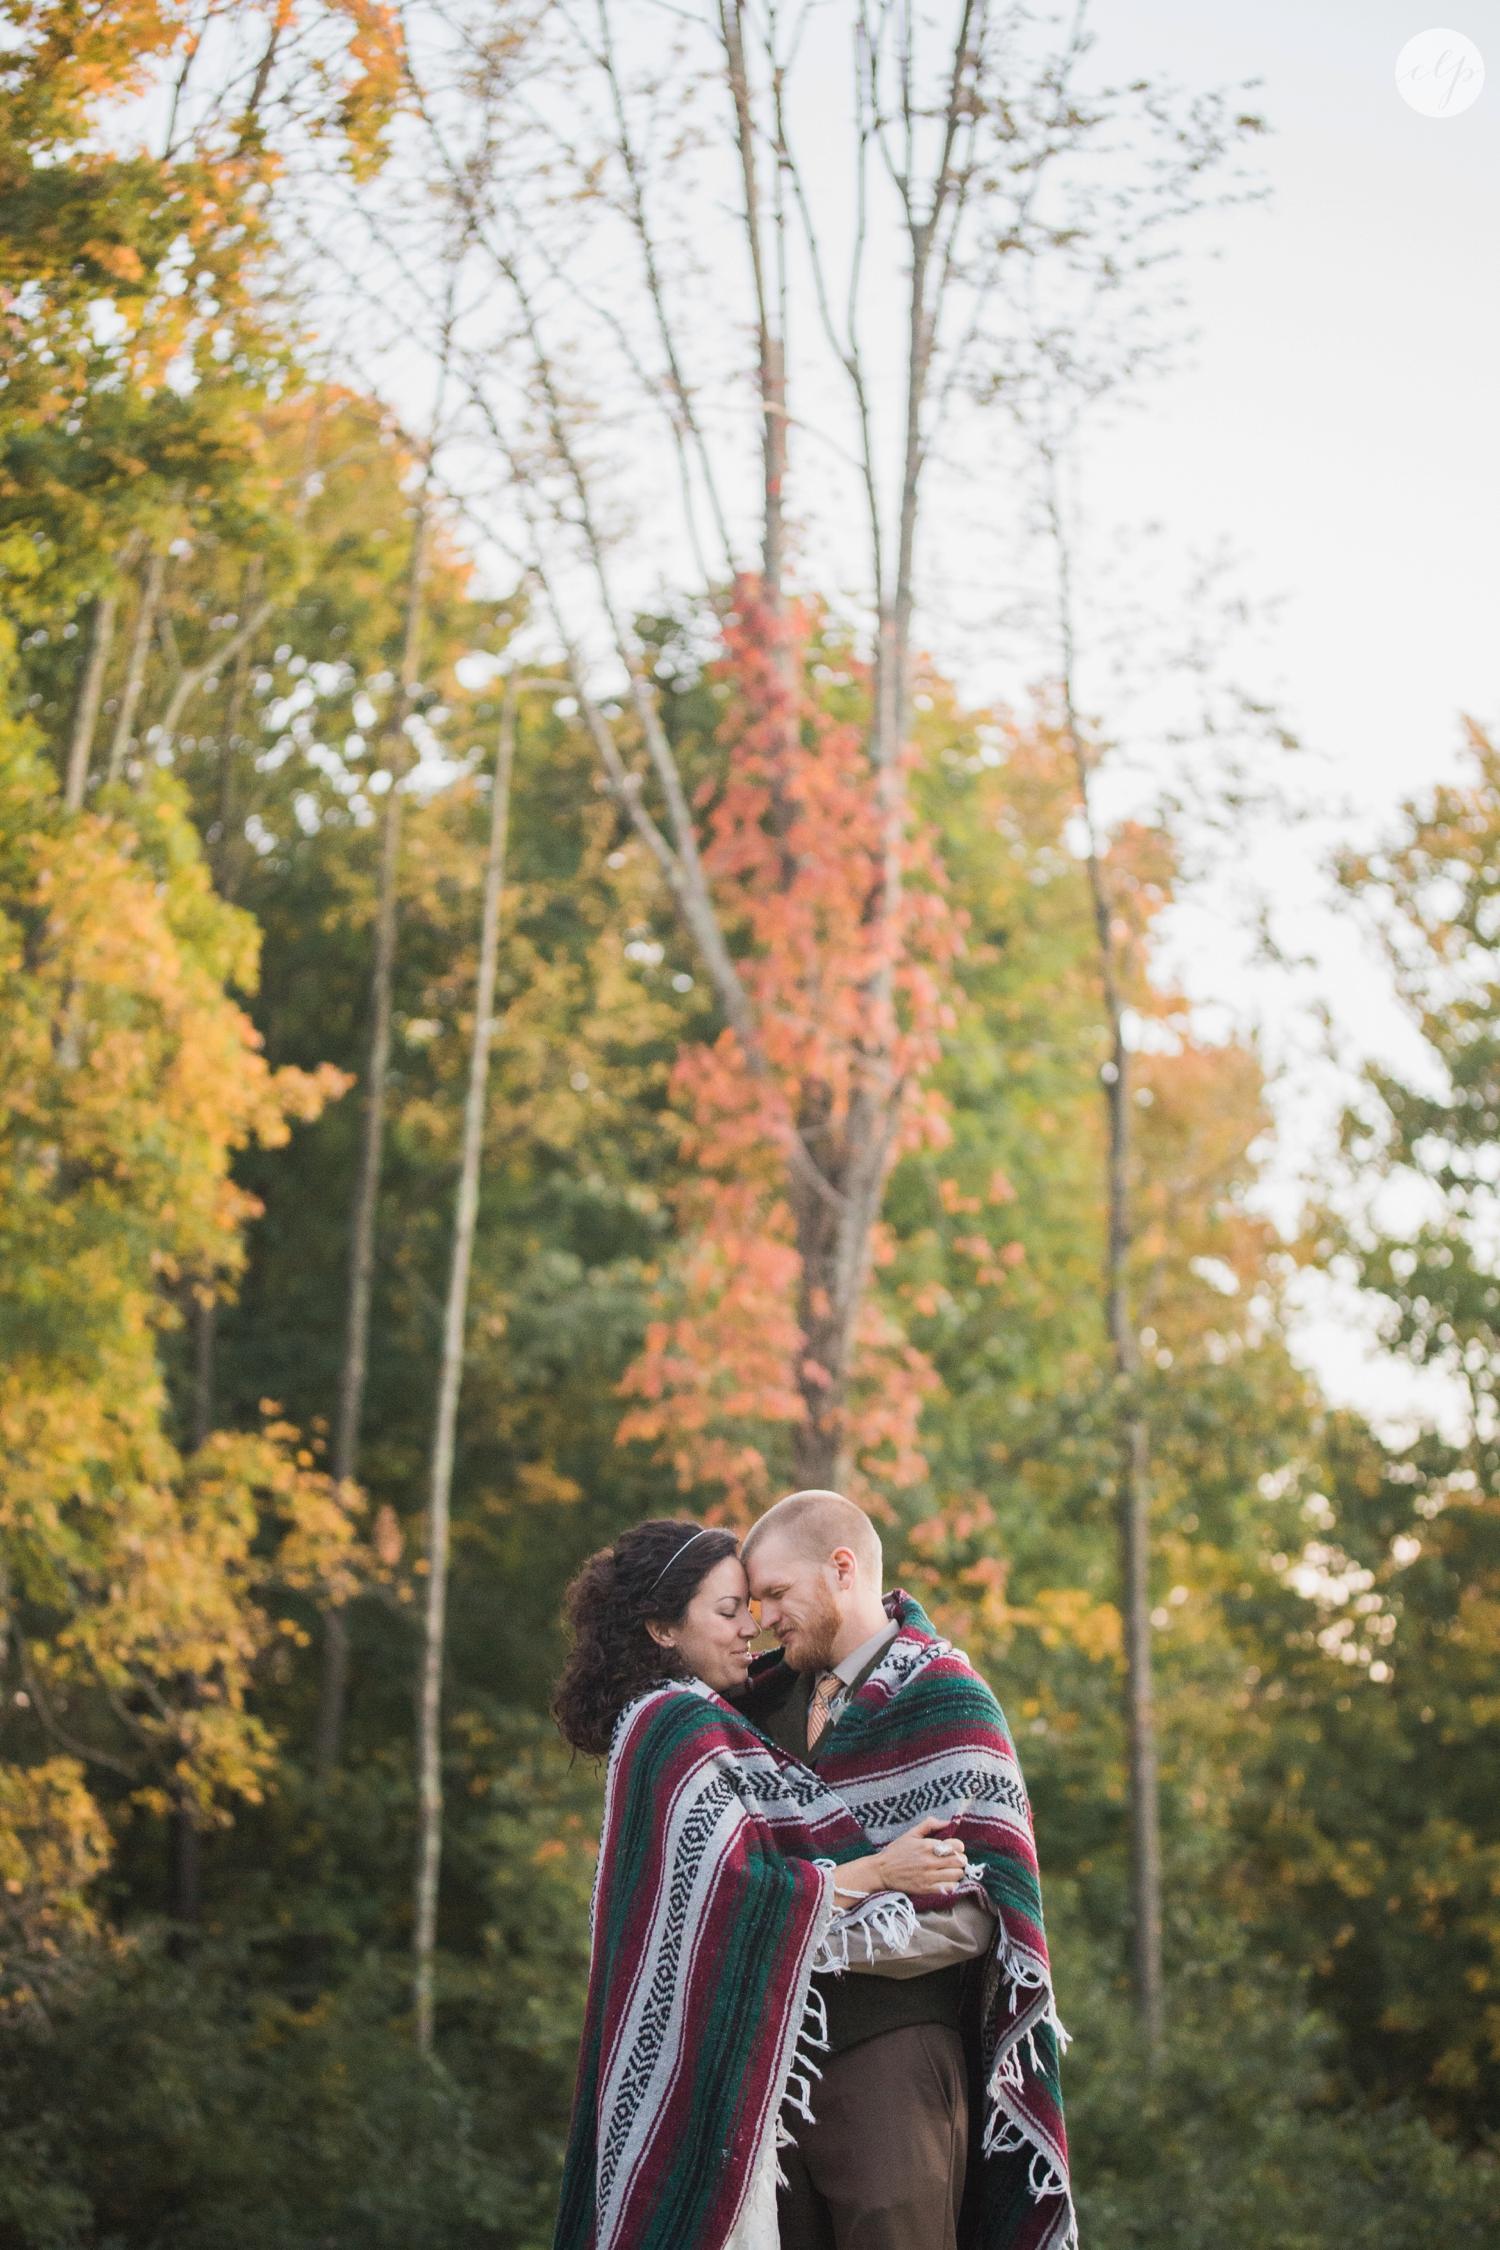 Outdoor-Wedding-in-the-Woods-Photography_4310.jpg